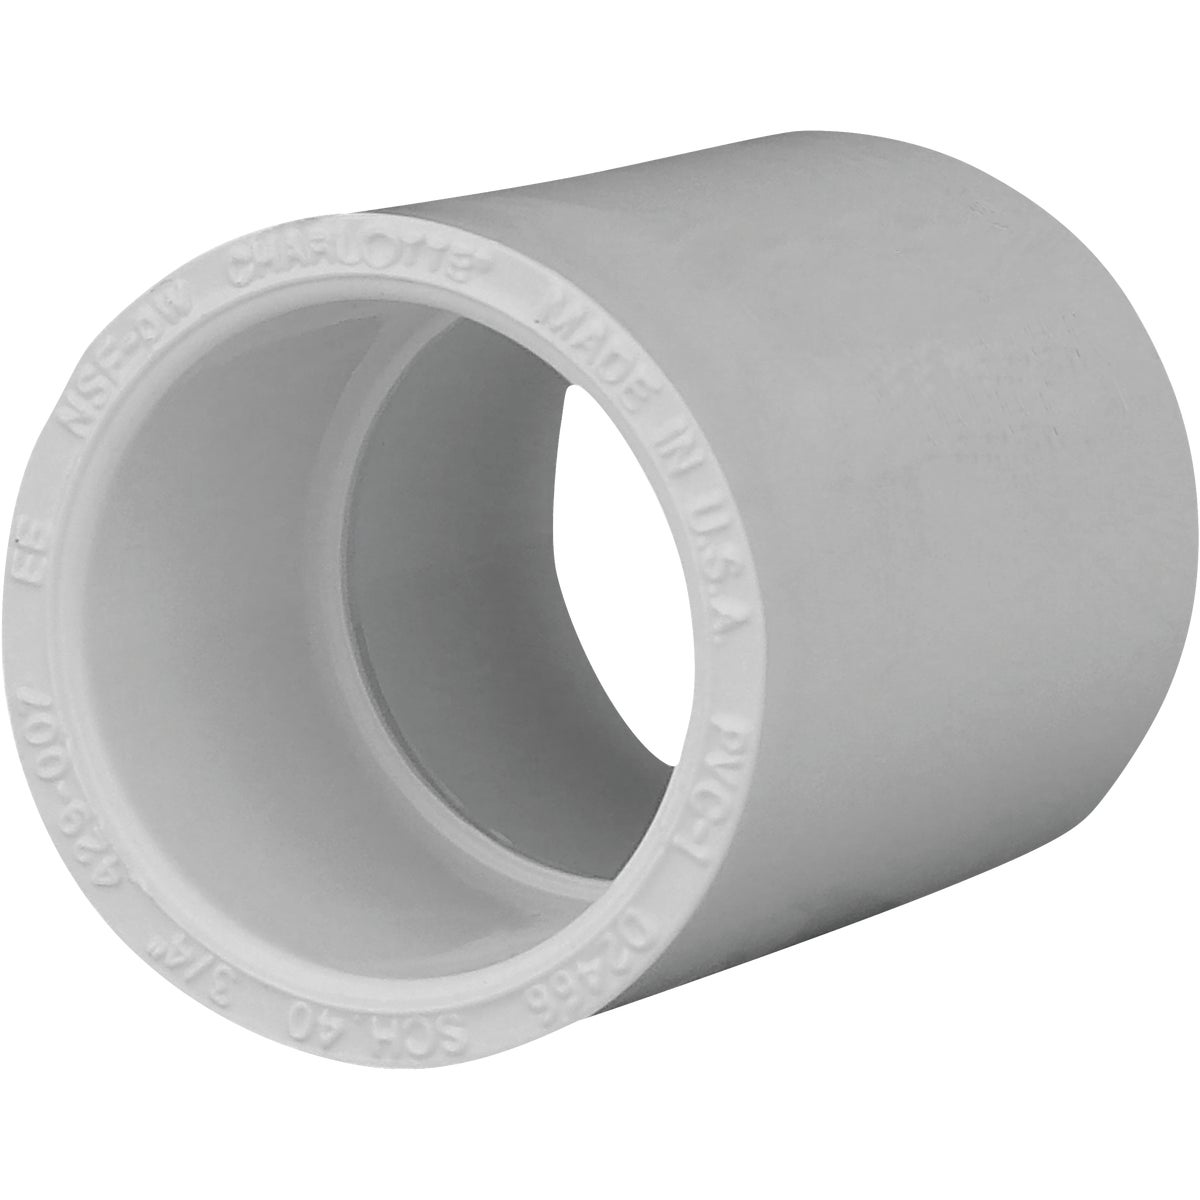 "3/4"" SCH40 PVC COUPLING"